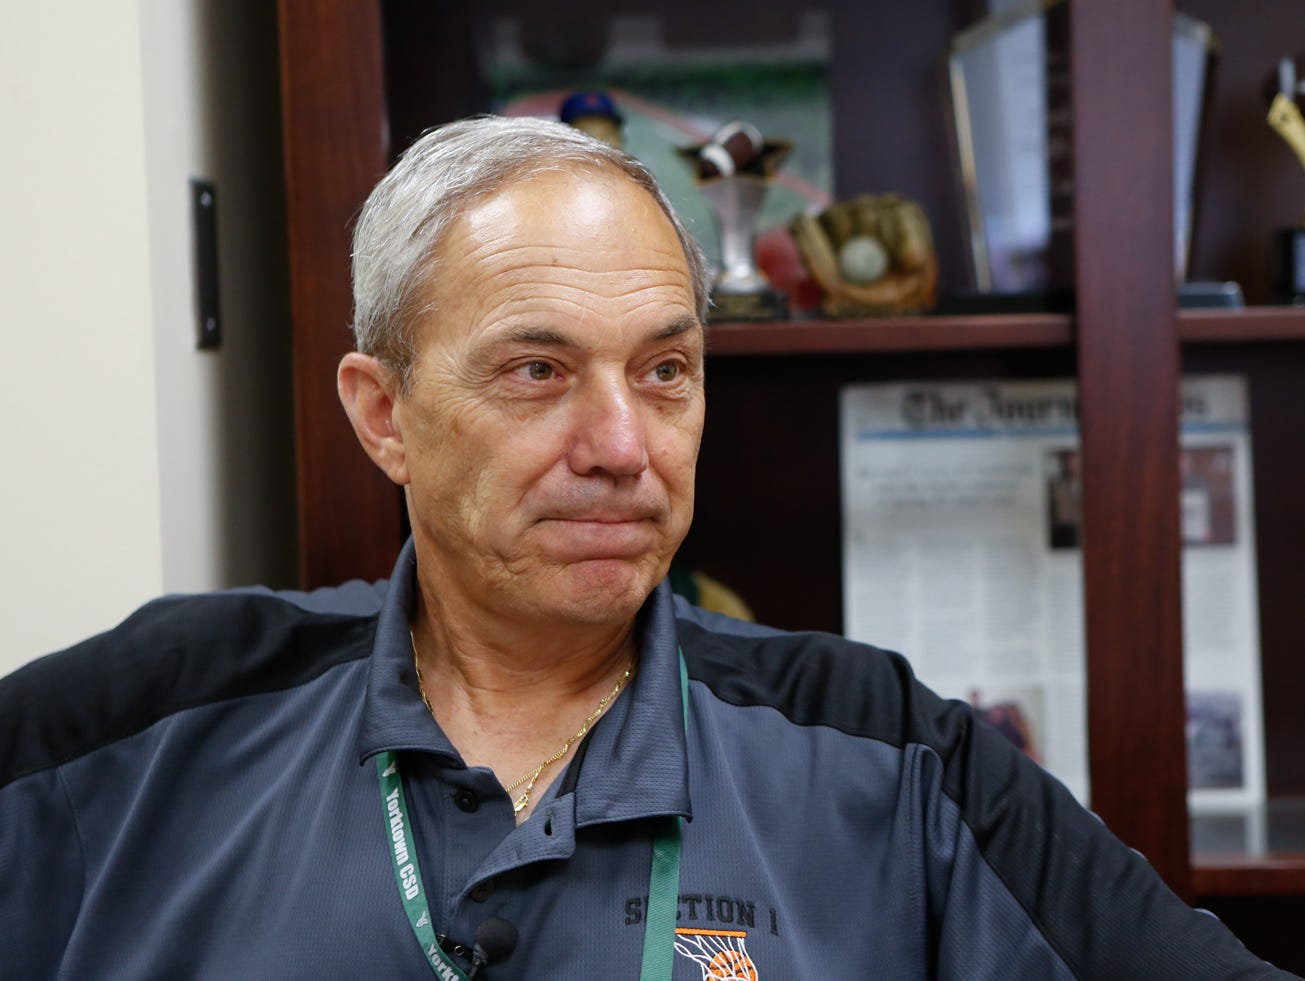 Yorktown High School Athletic Director Fio Nardone